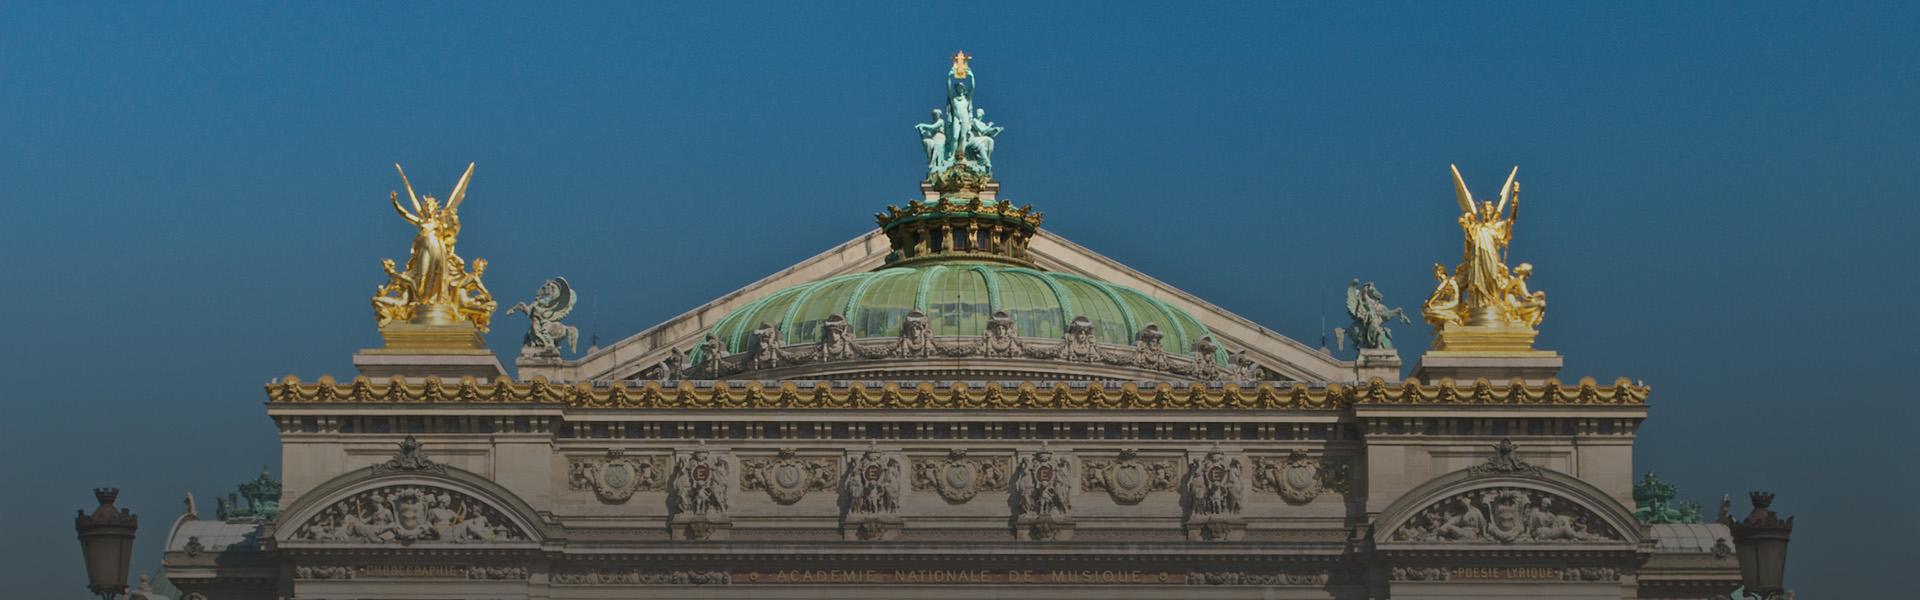 Louer un bureau à Opéra, Paris